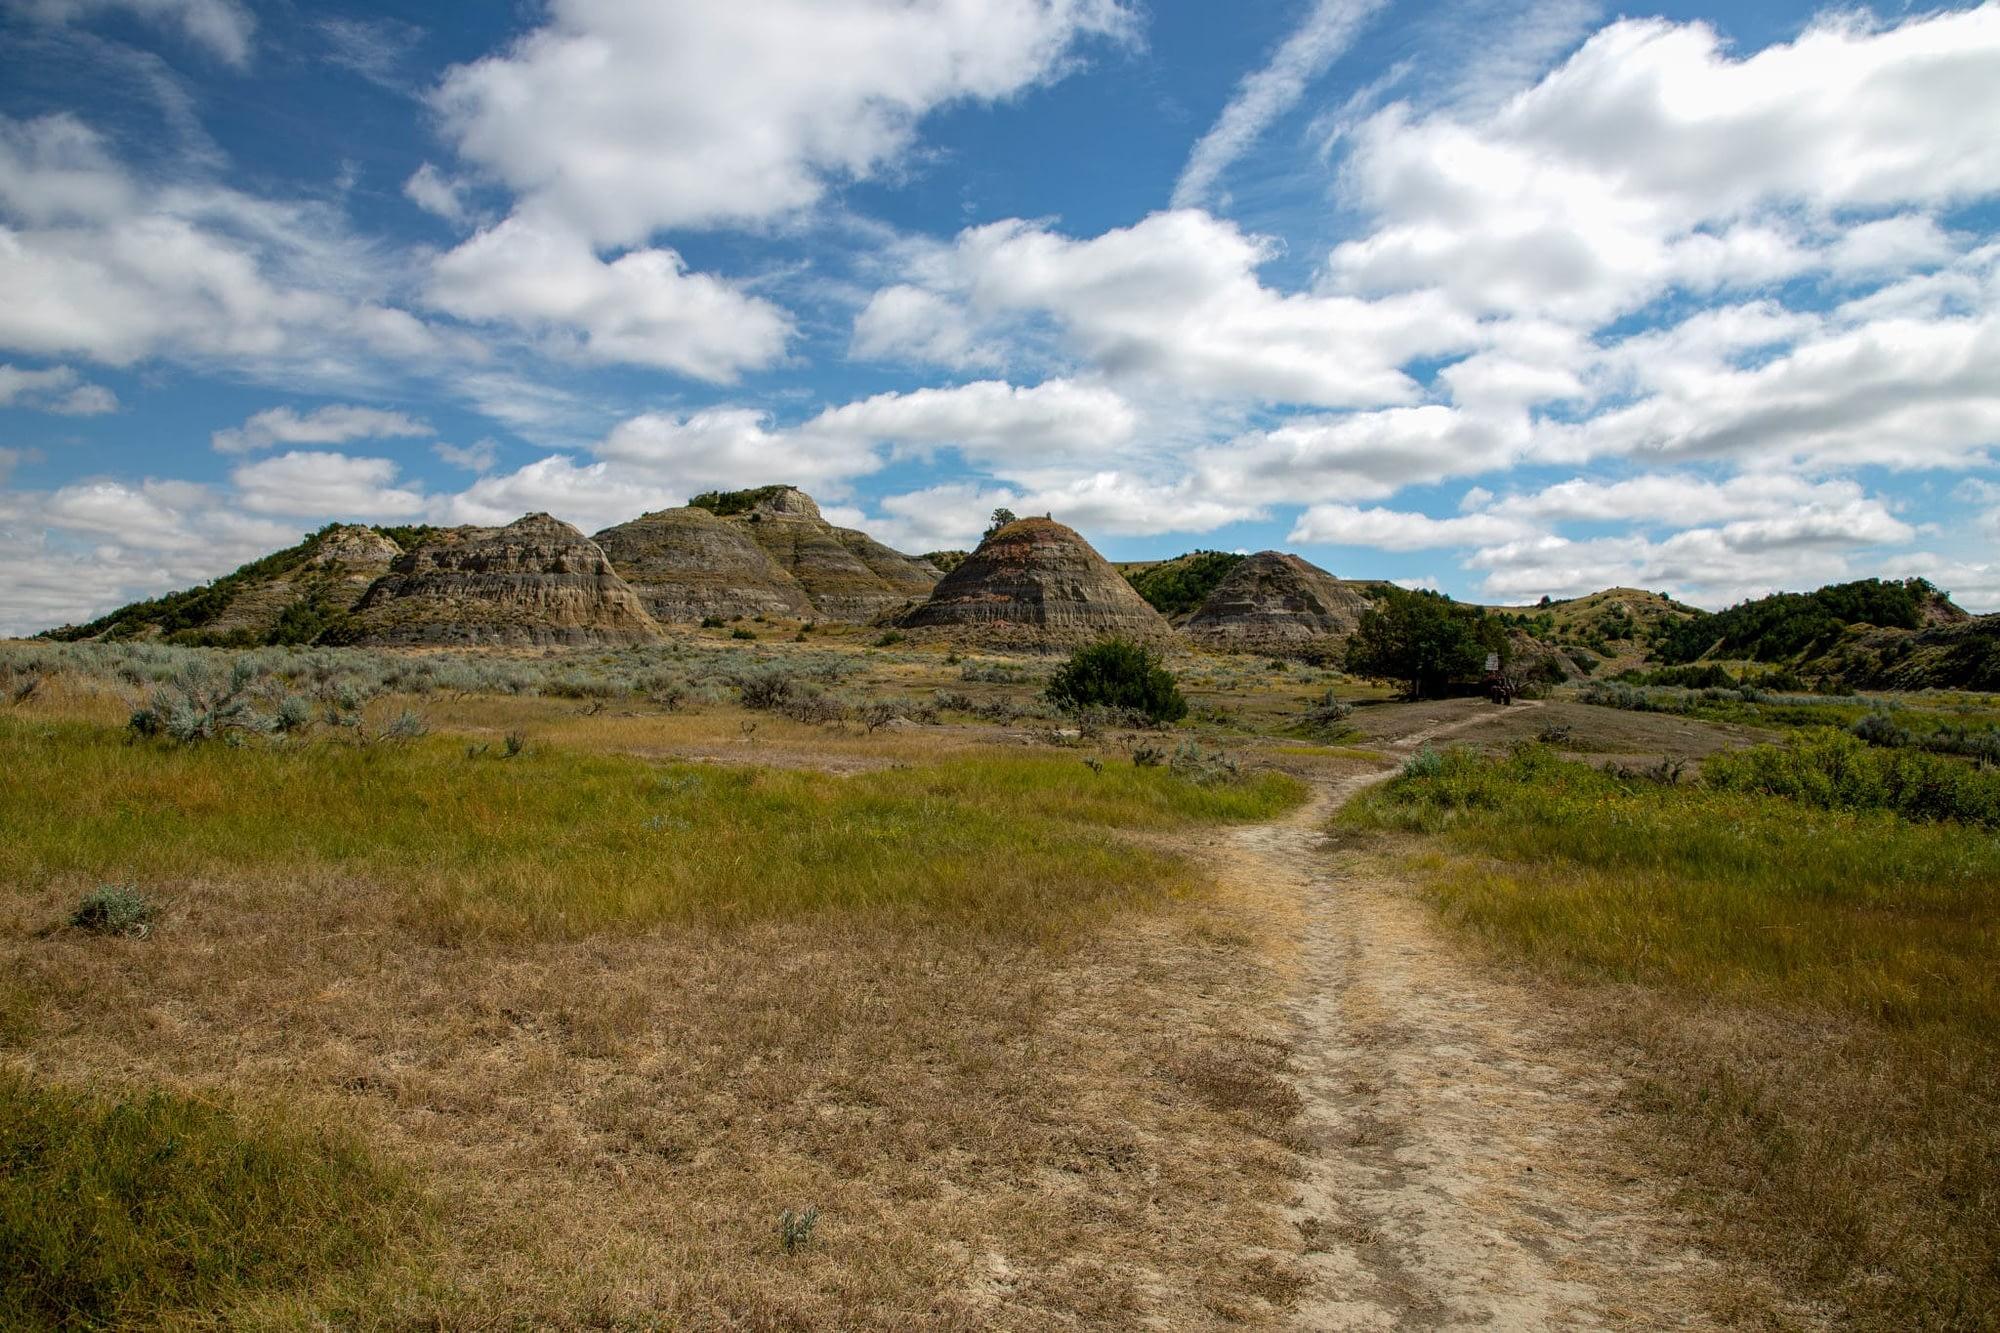 Grassy badlands of Theodore Roosevelt National Park